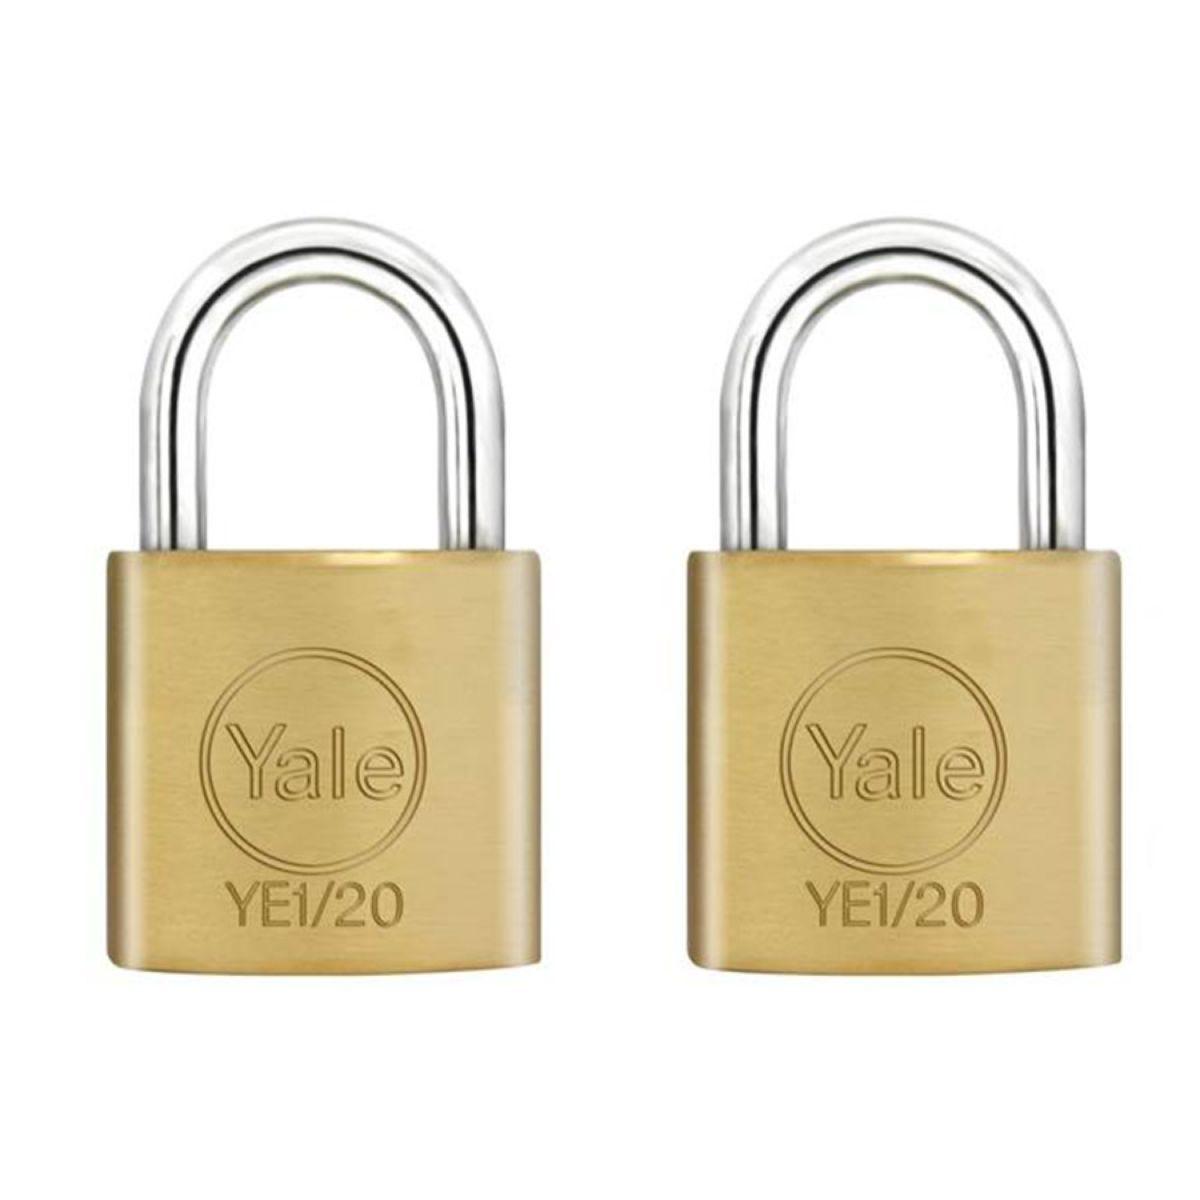 Yale 20mm Brass Padlocks - Pack of 2